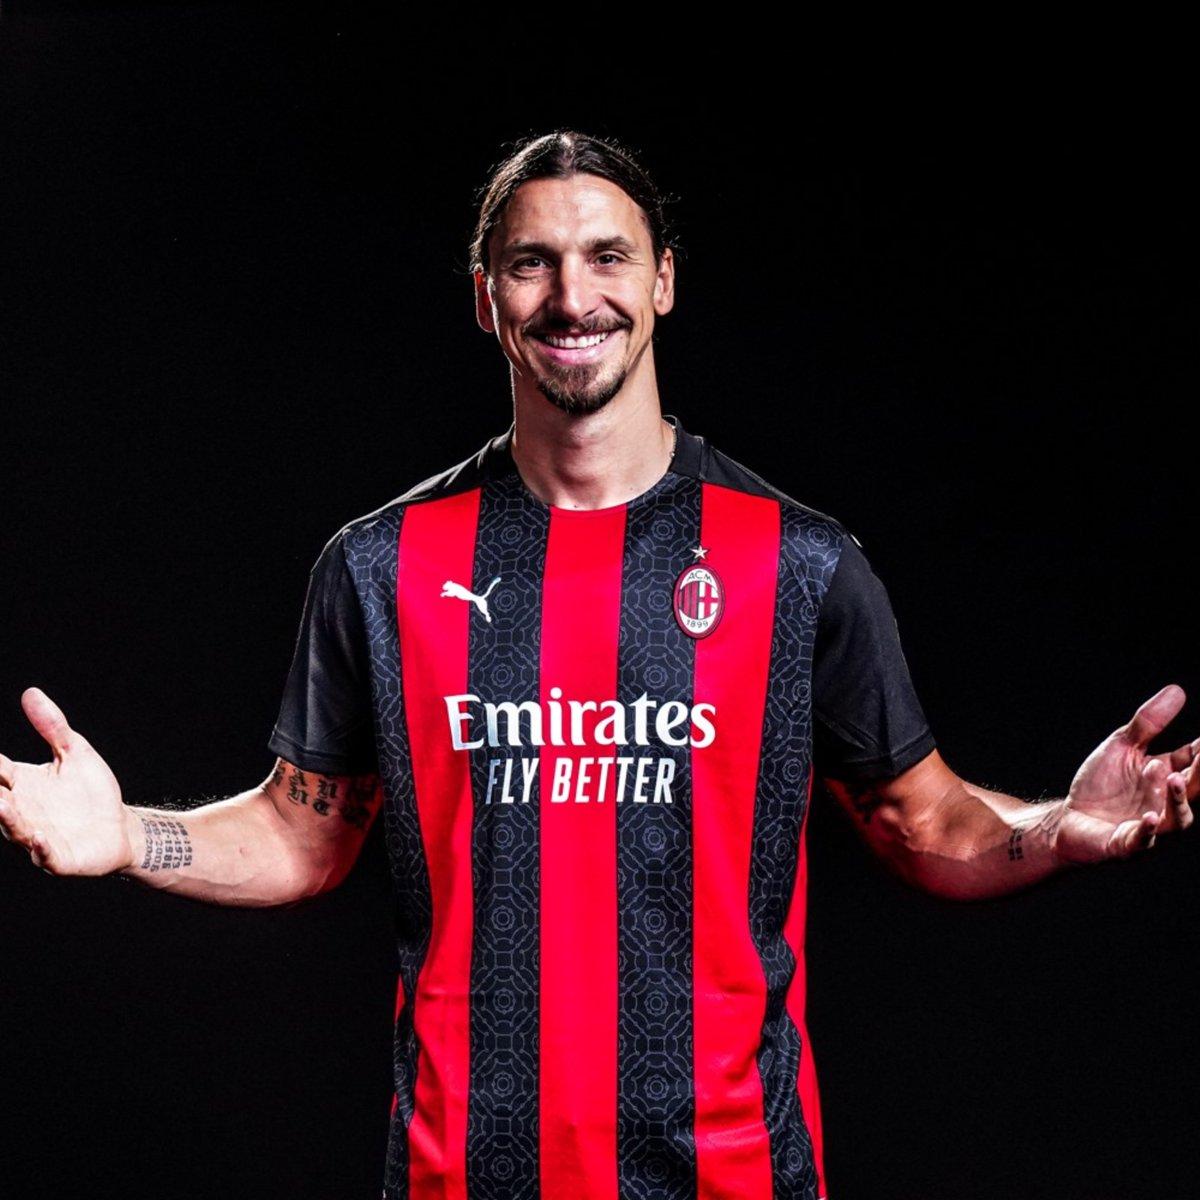 @InvictosSomos's photo on Juventus